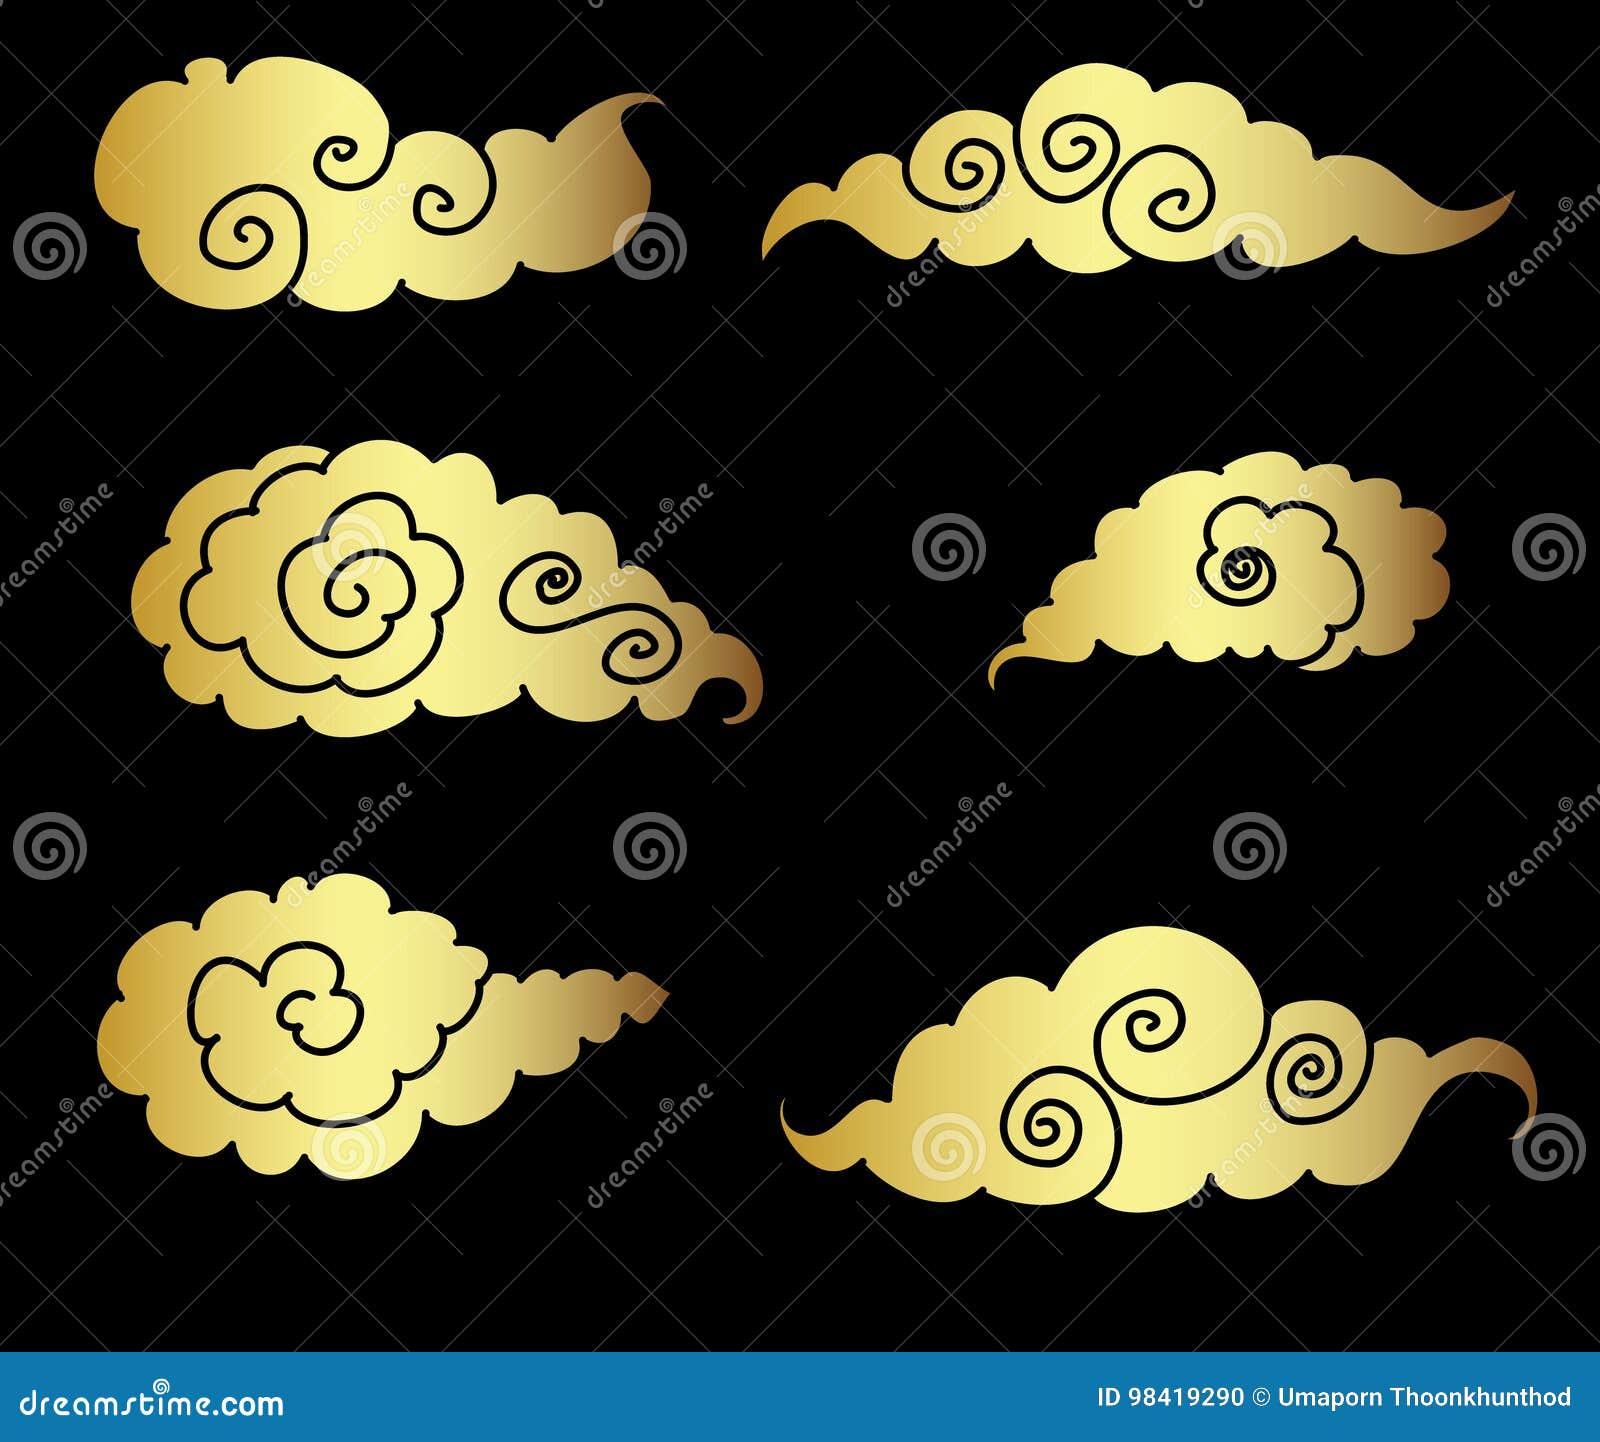 tatouage nuage japonais. Black Bedroom Furniture Sets. Home Design Ideas